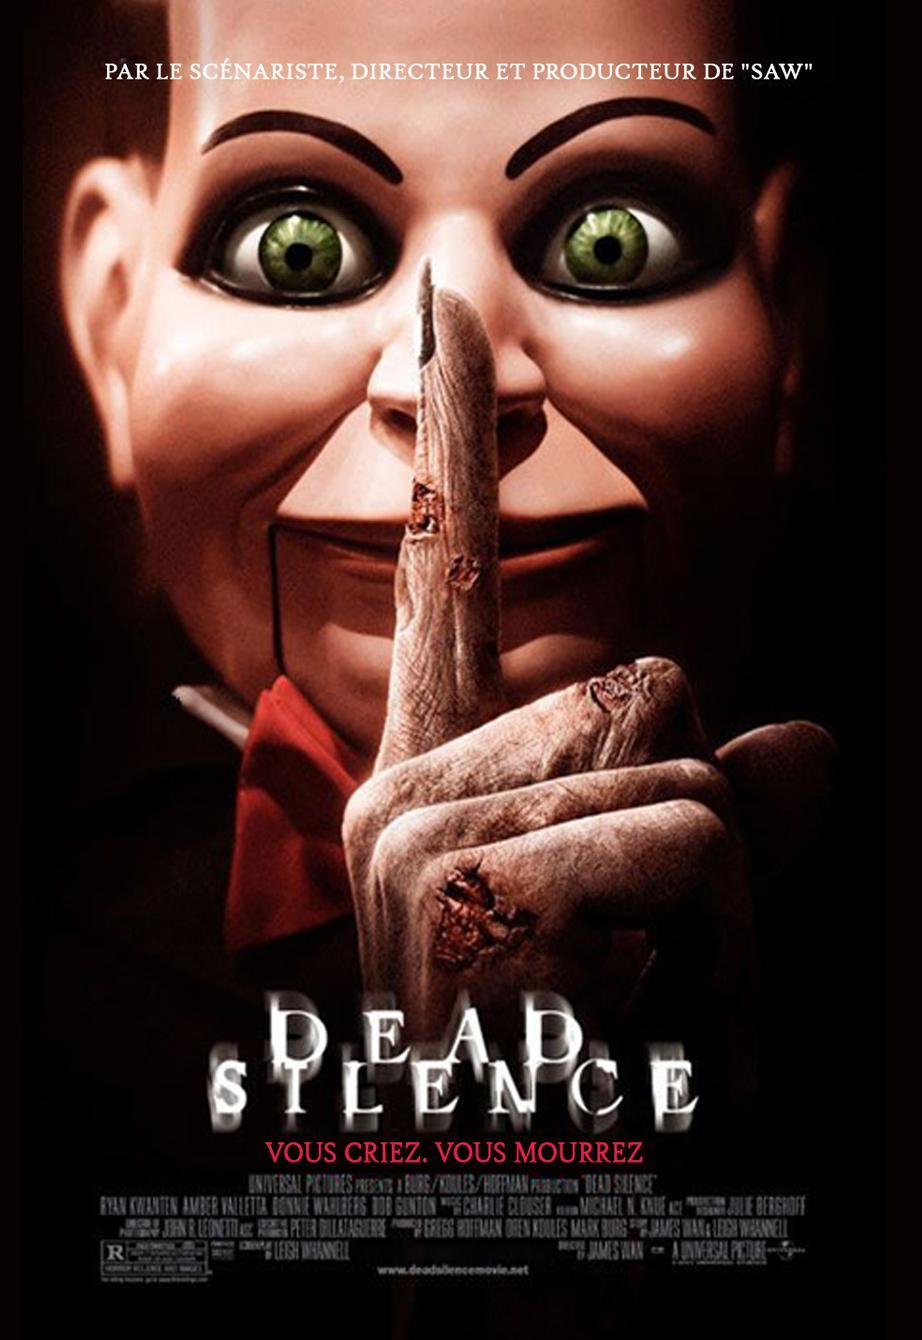 Dead silence (2007) de James Wan